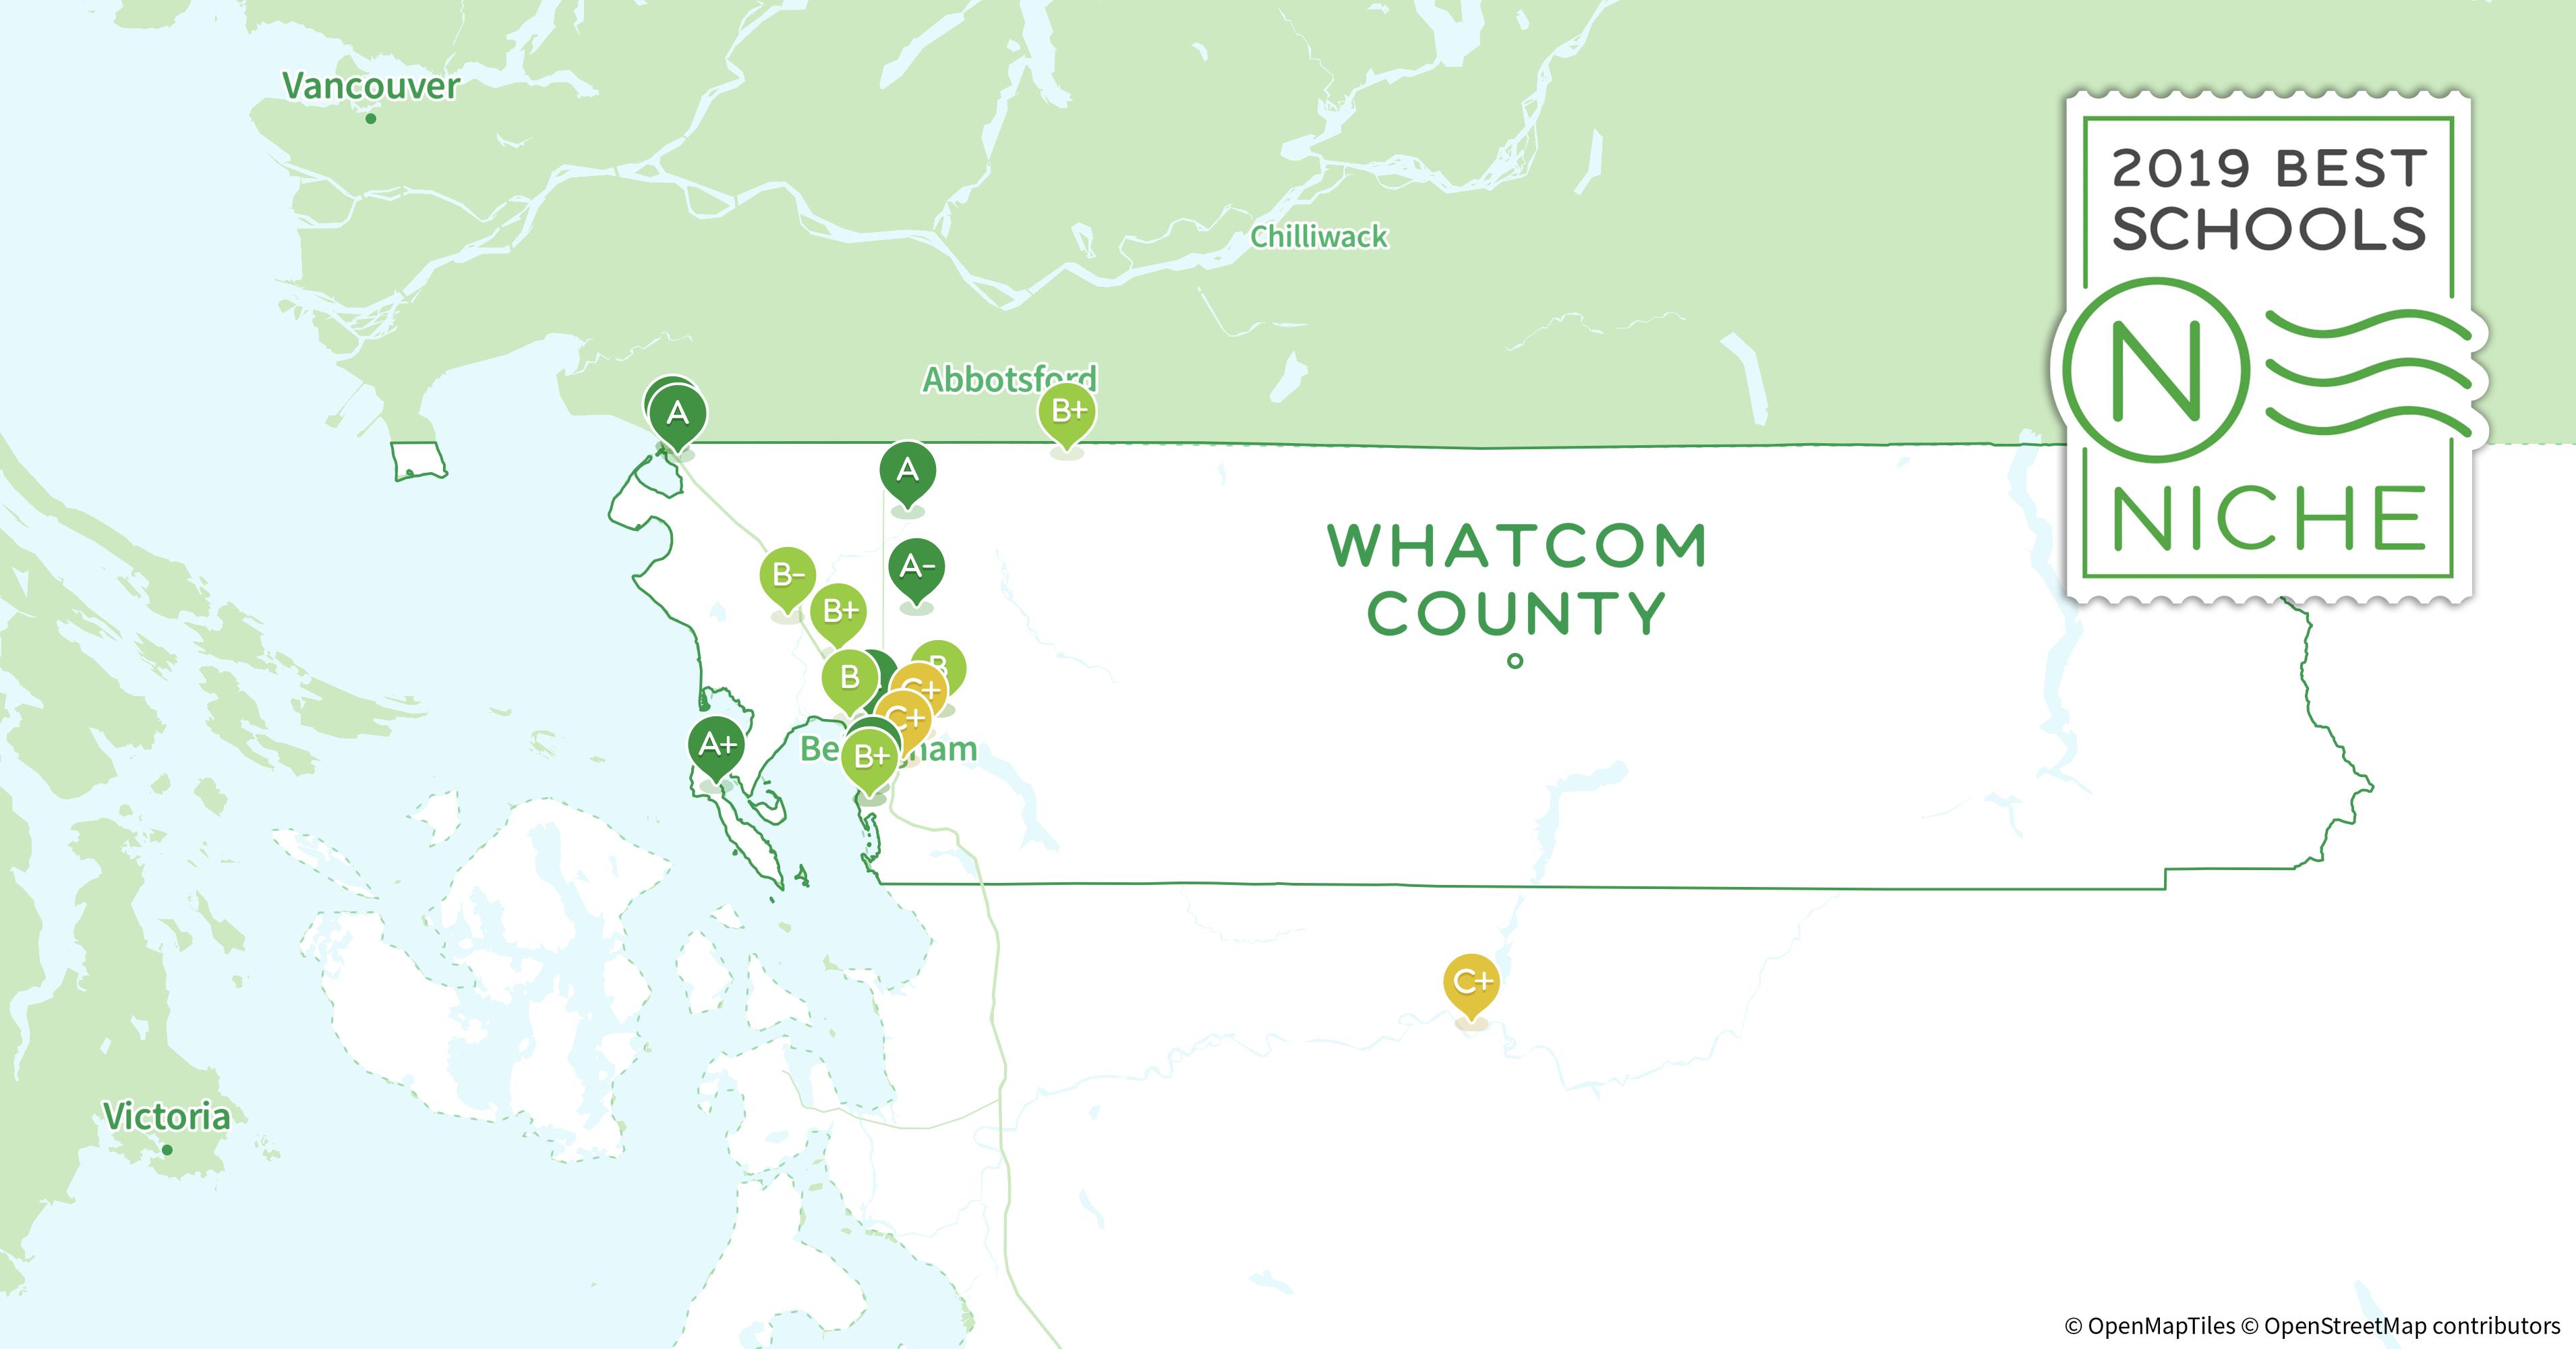 Districts in Whatcom County, WA - Niche on